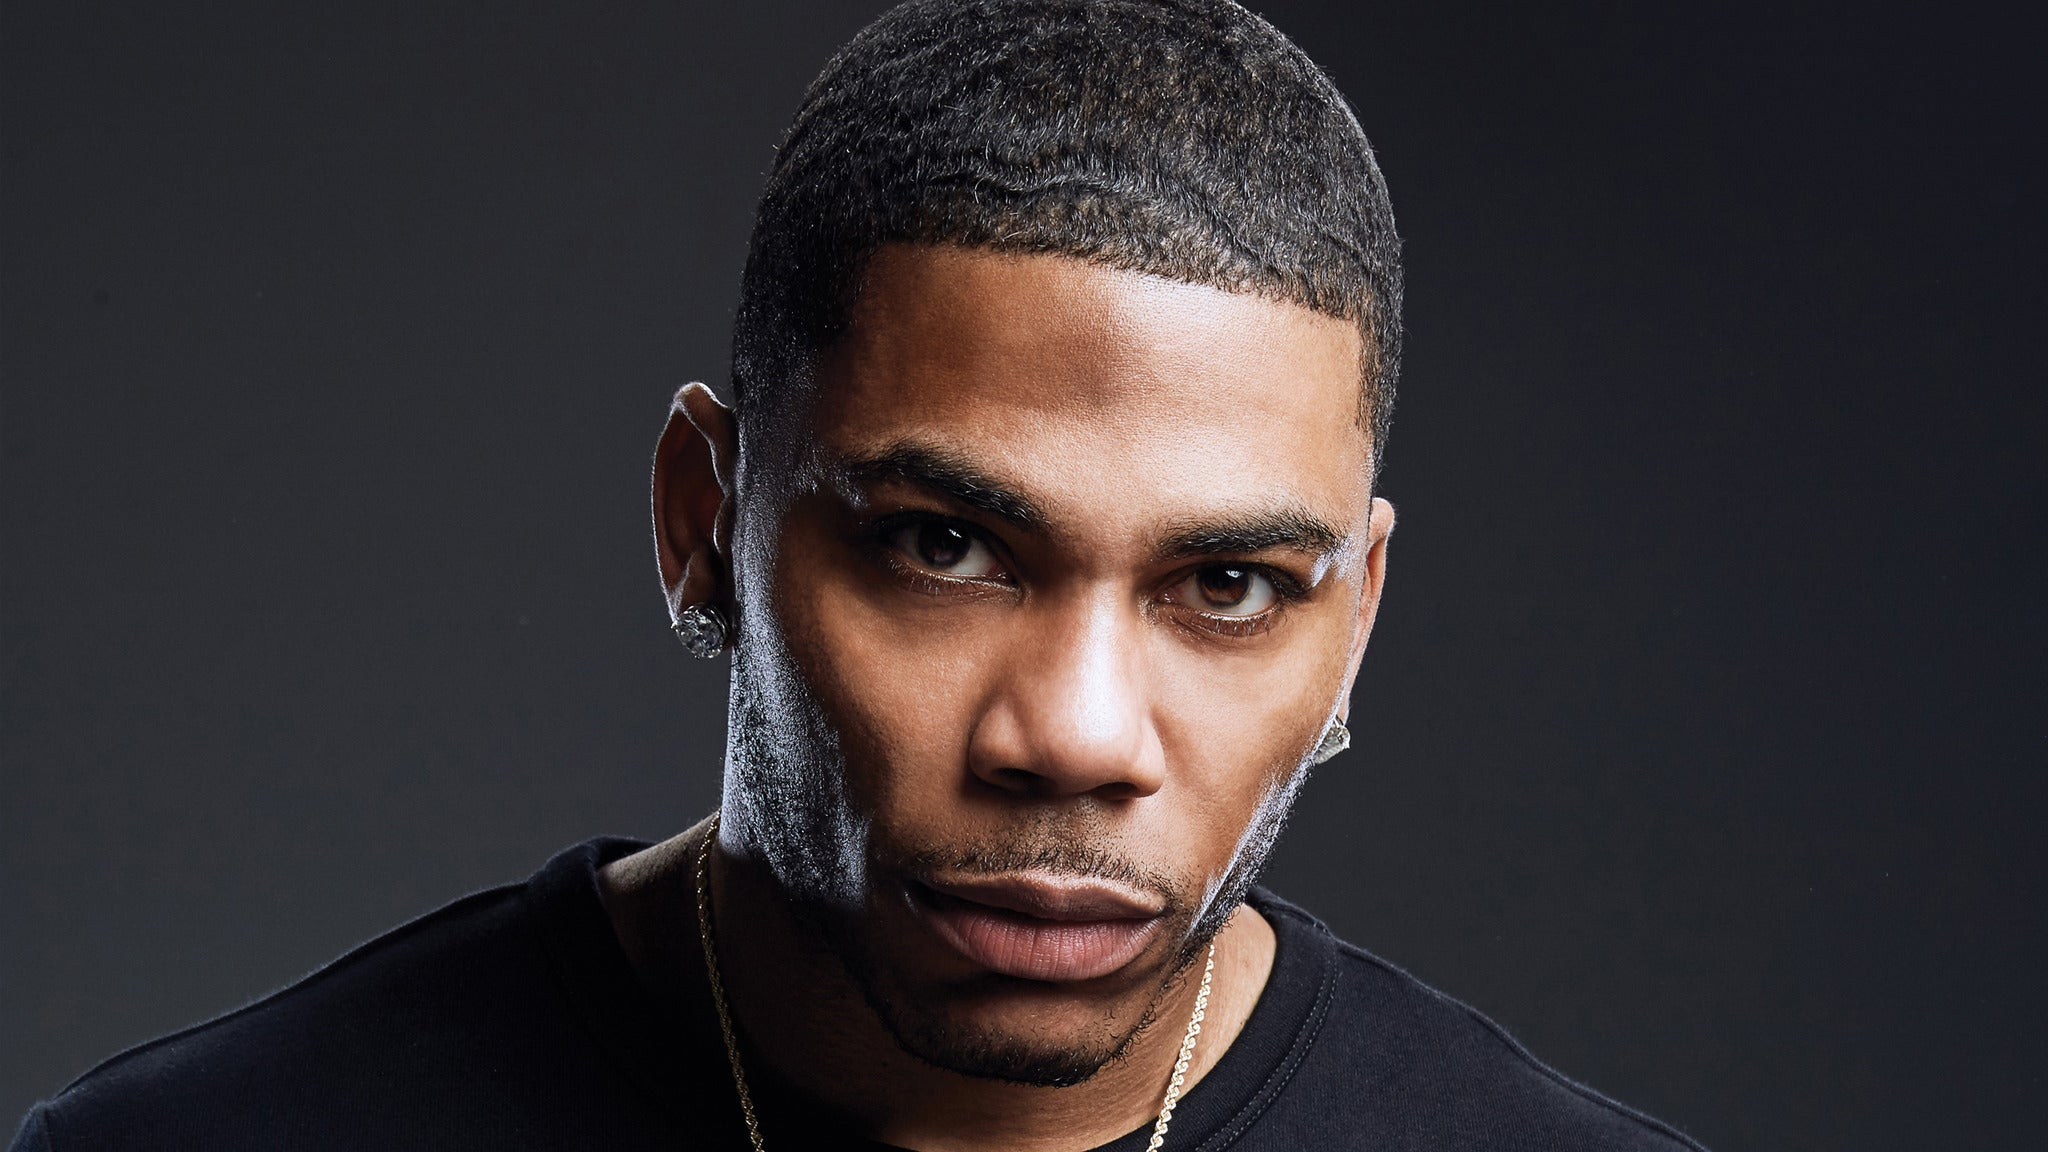 Nelly - Lil Bit of Music Series presale code for concert tickets in Nashville, TN (Bridgestone Arena)